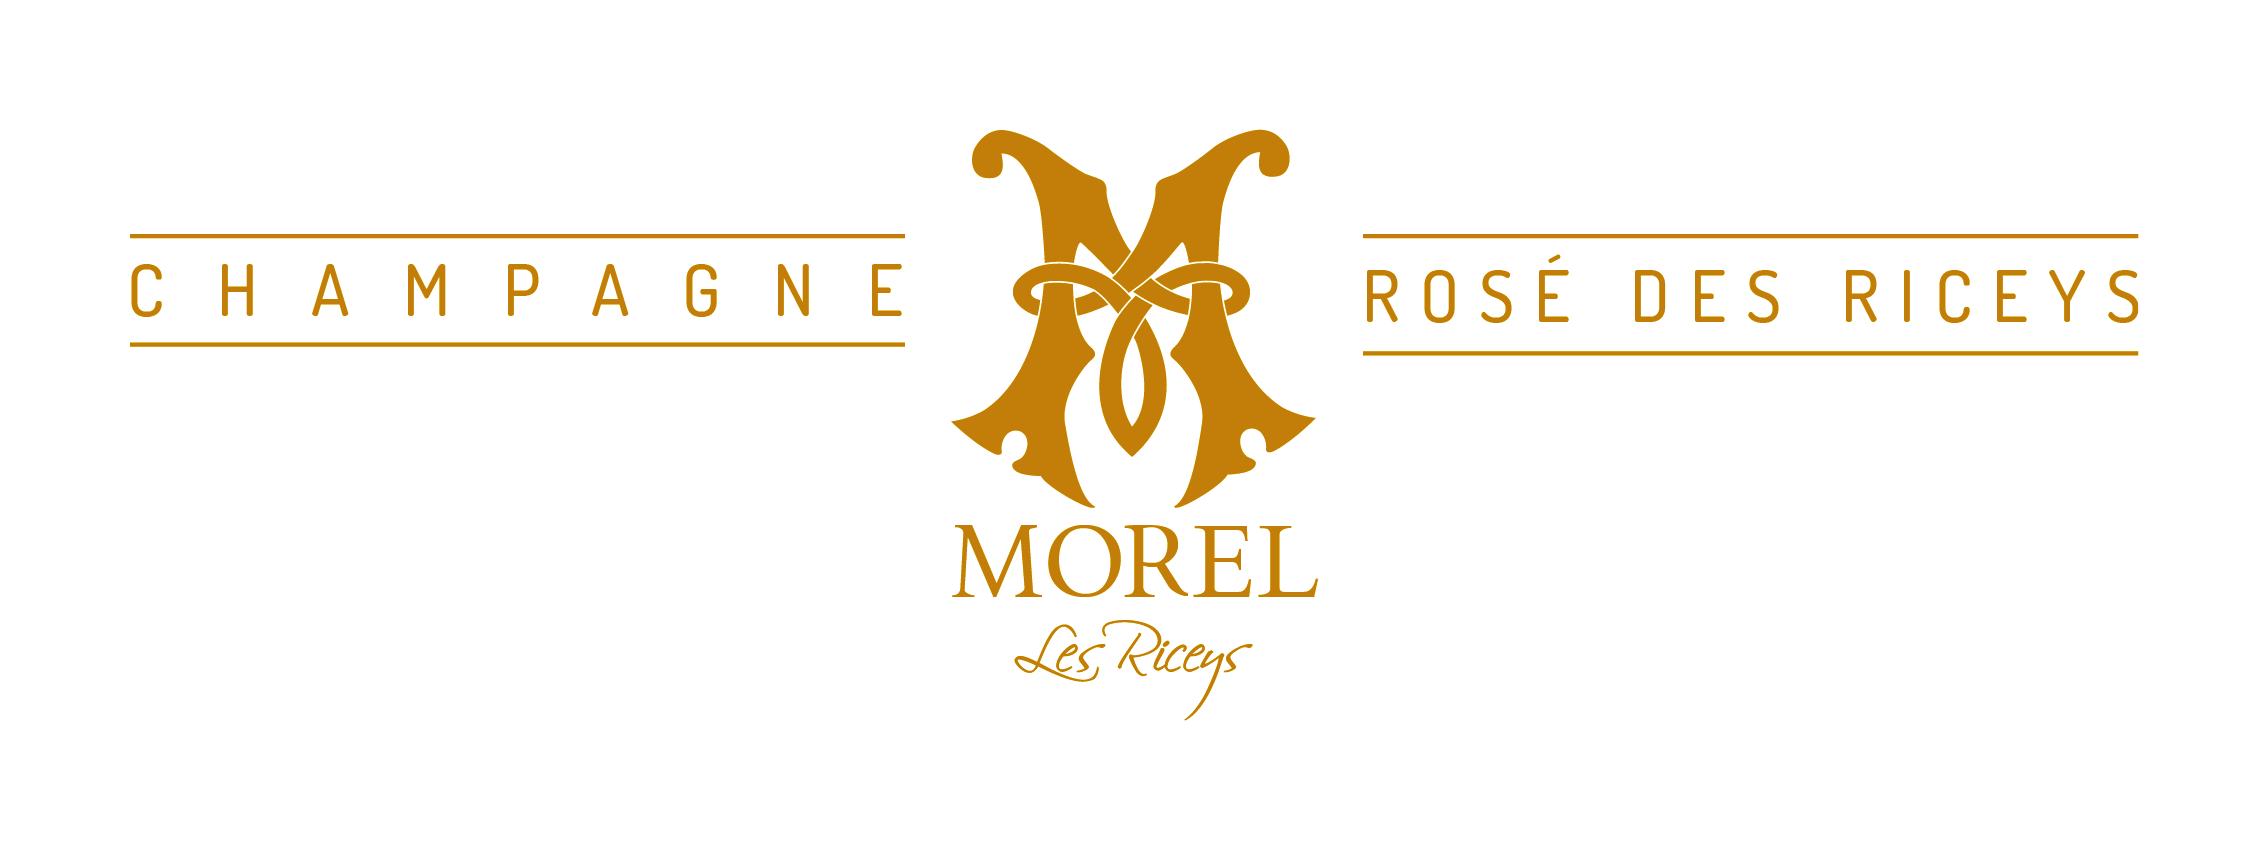 Champagne Morel